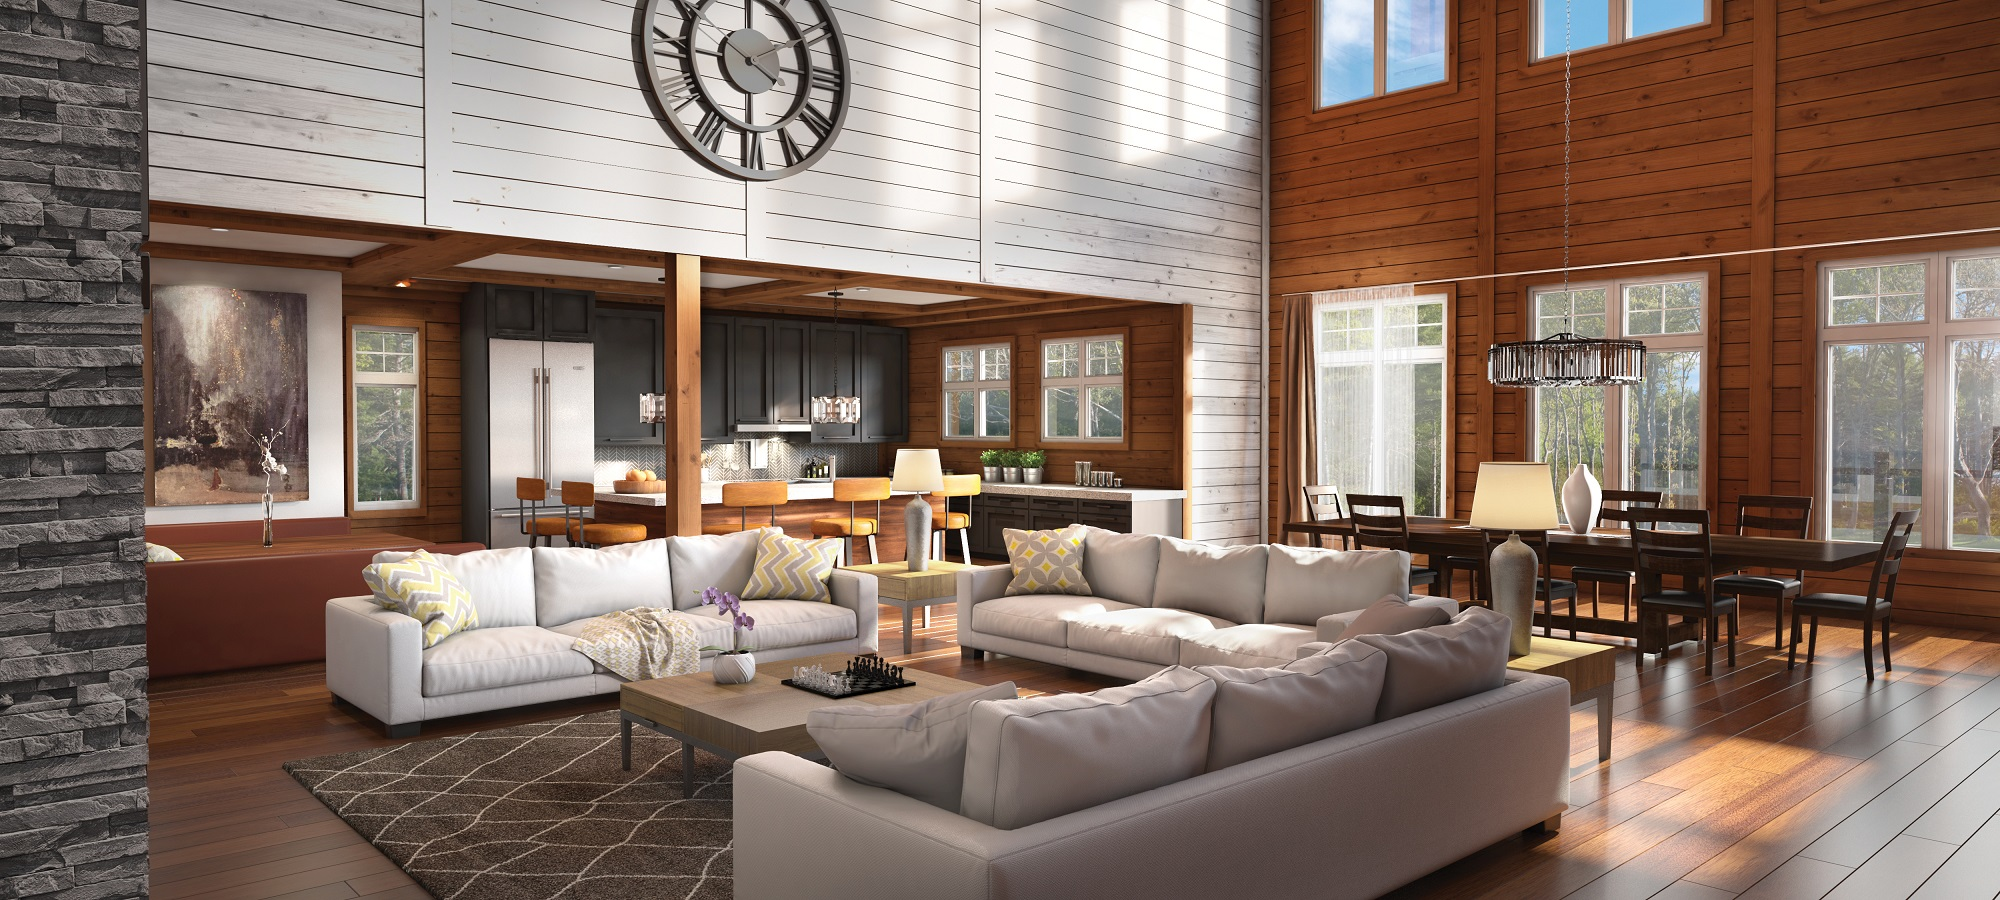 Timber Block jackson craftsman home interior